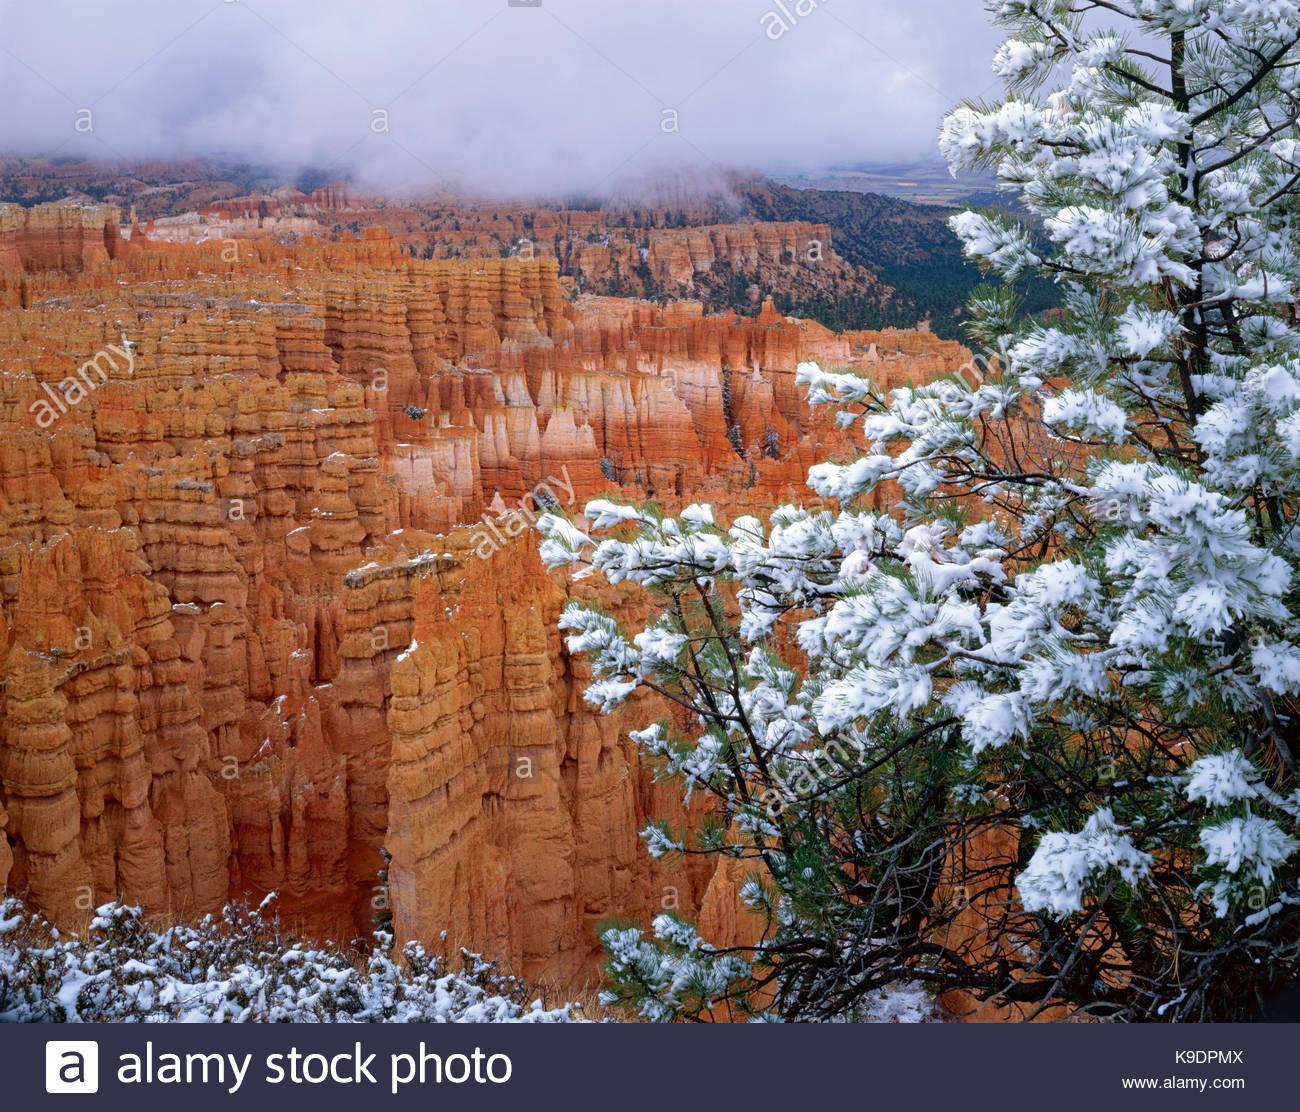 Tempesta su città silenziosa, Parco Nazionale di Bryce Canyon, Utah Immagini Stock